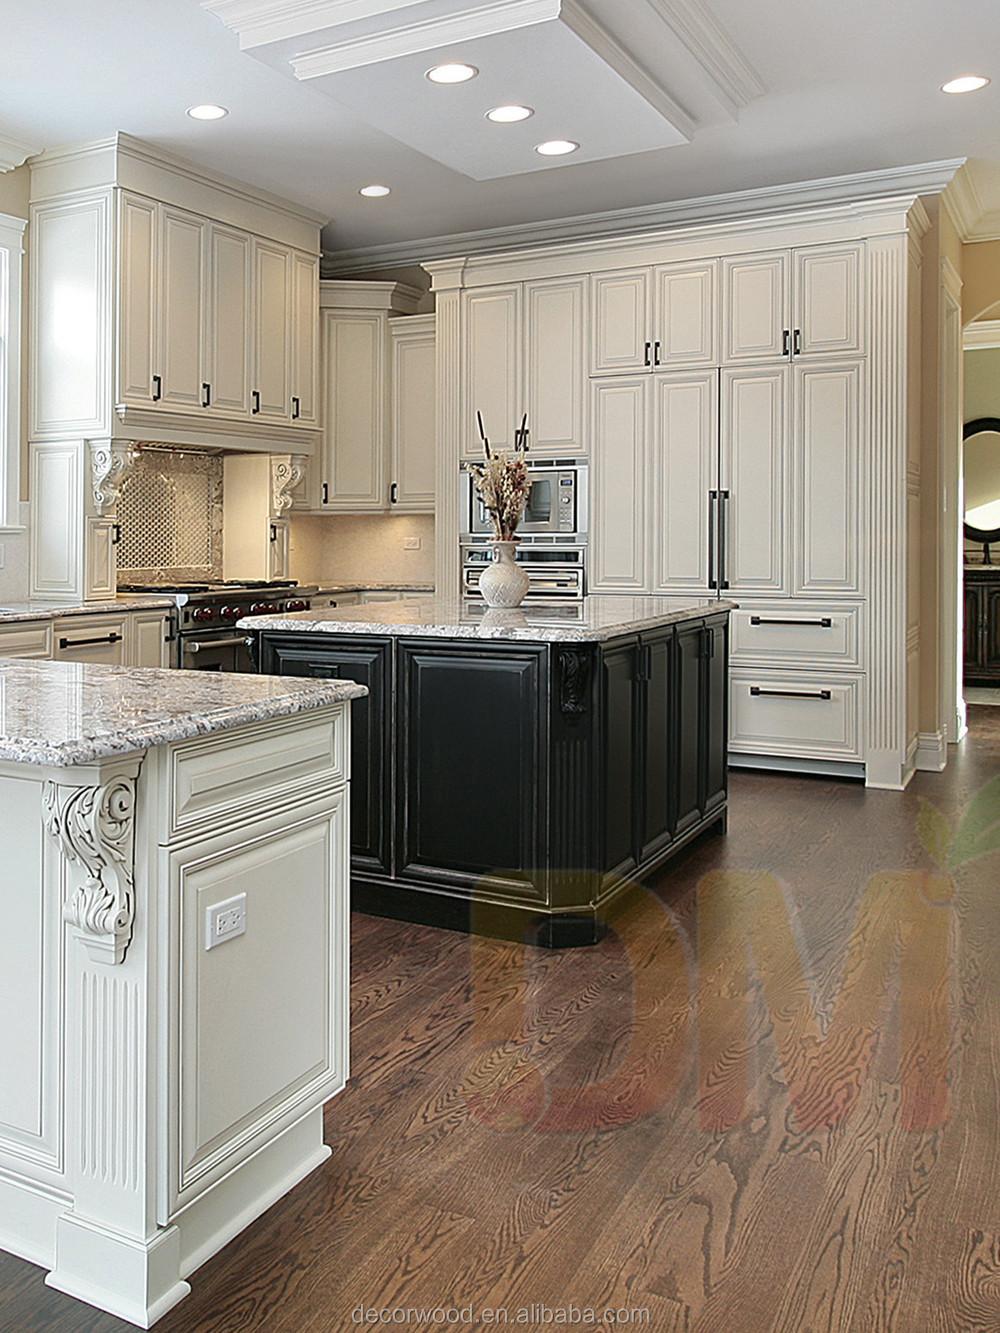 Badkamer wastafel maken - Ontwerp witte keukens ...